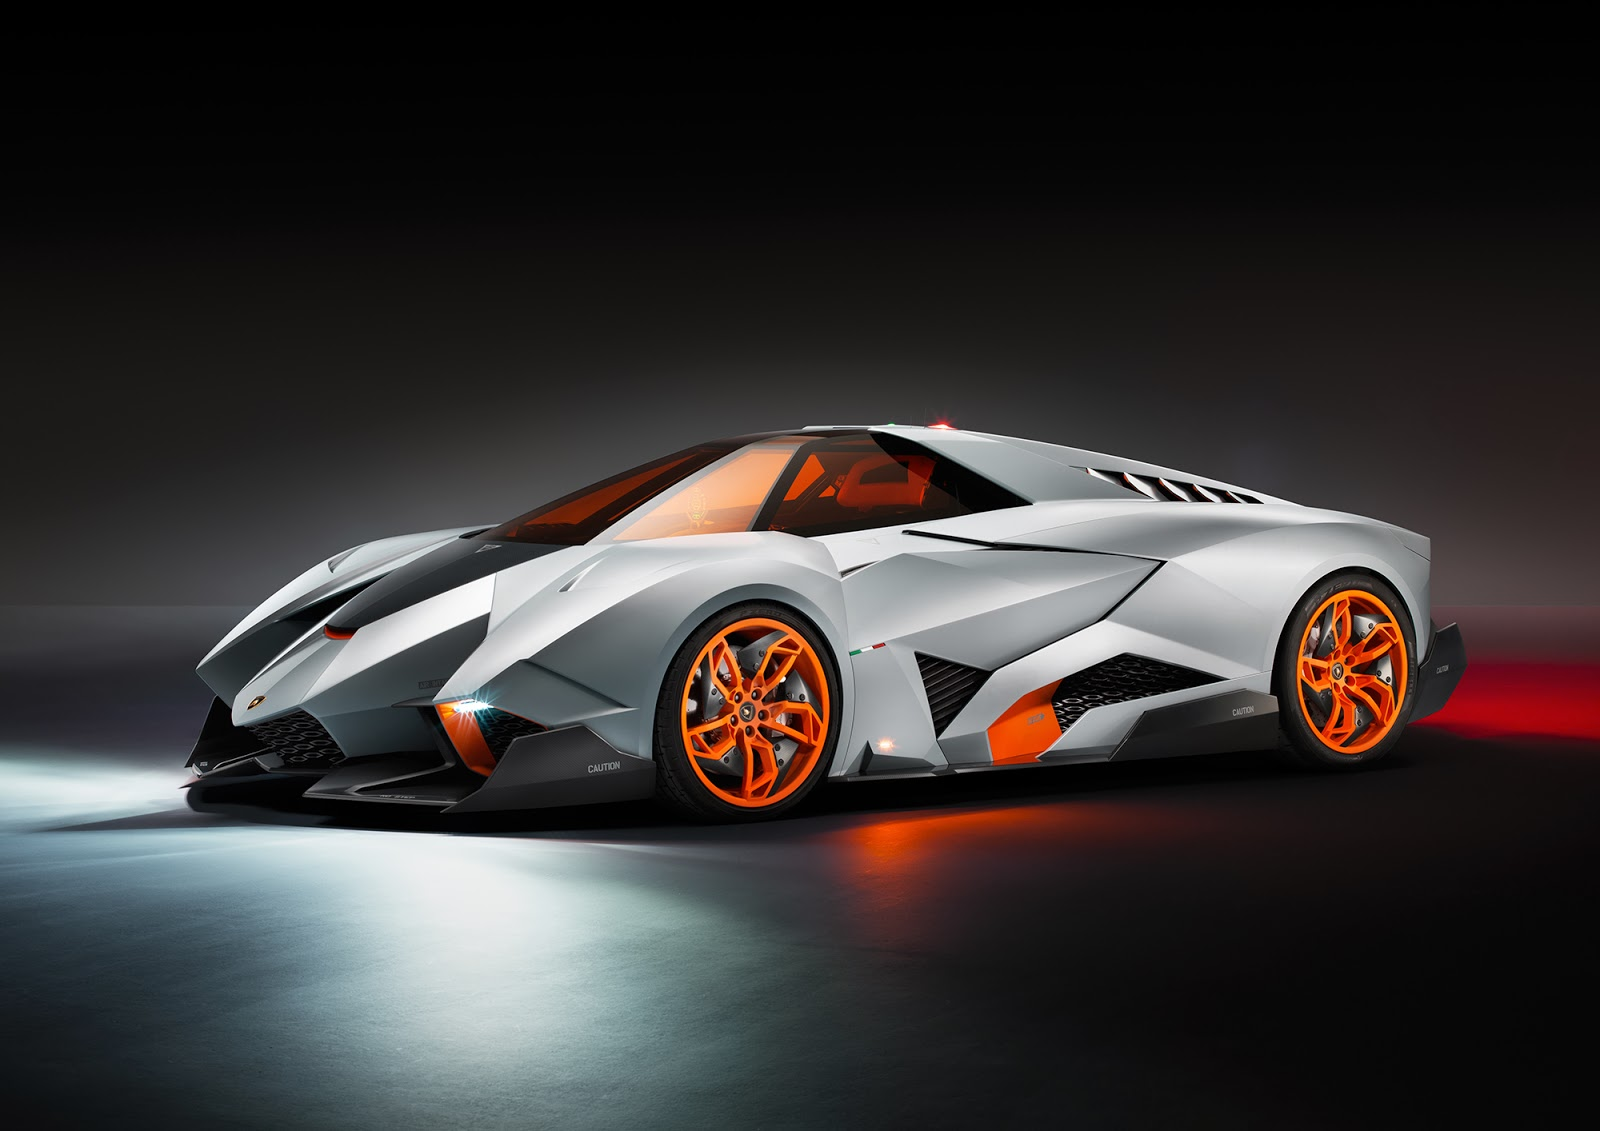 Foto Mobil Keren Lamborghini Egoista Front Side View